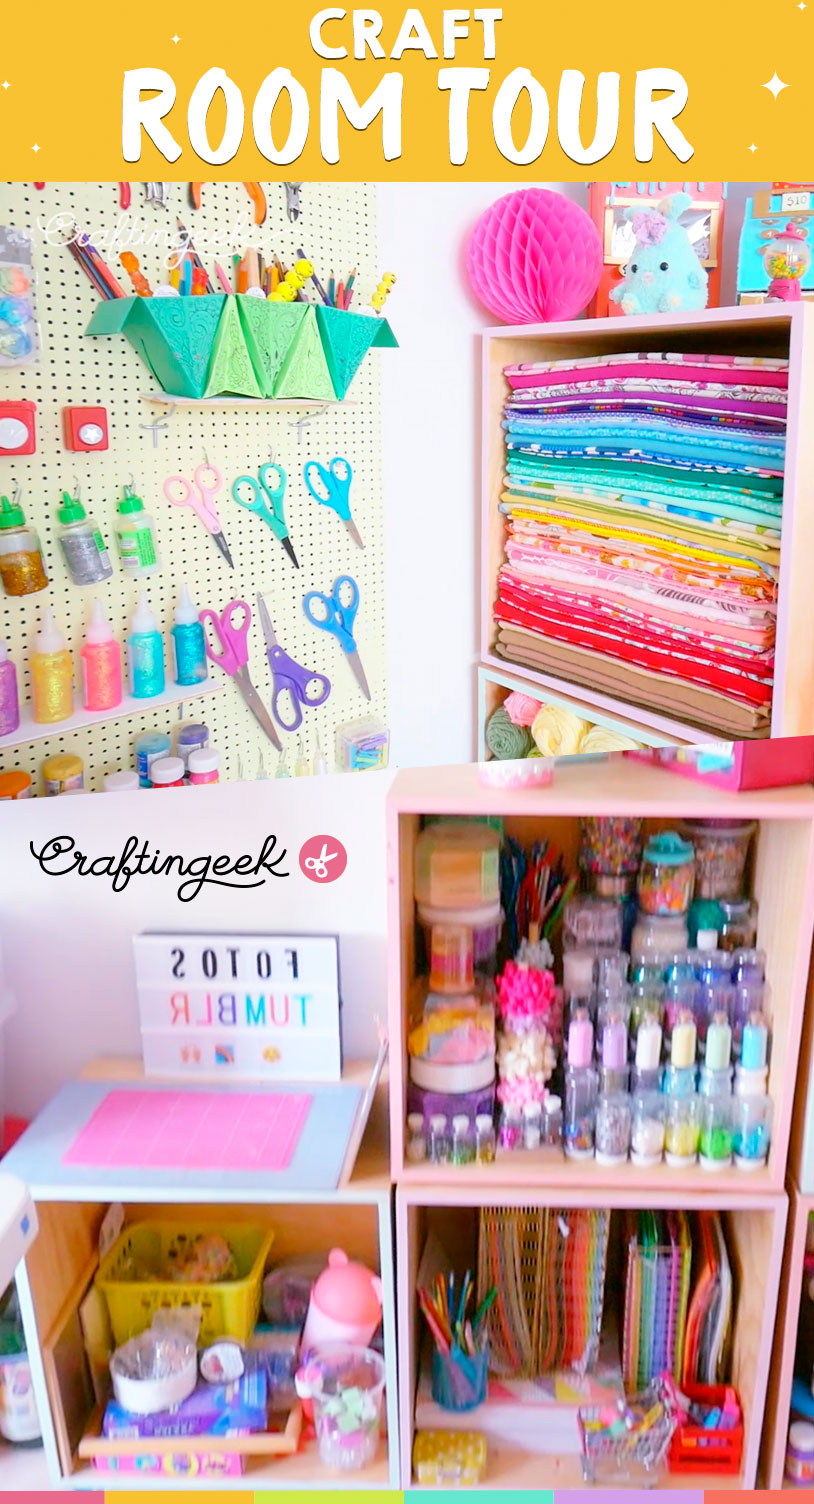 estudio crafty craftingeek